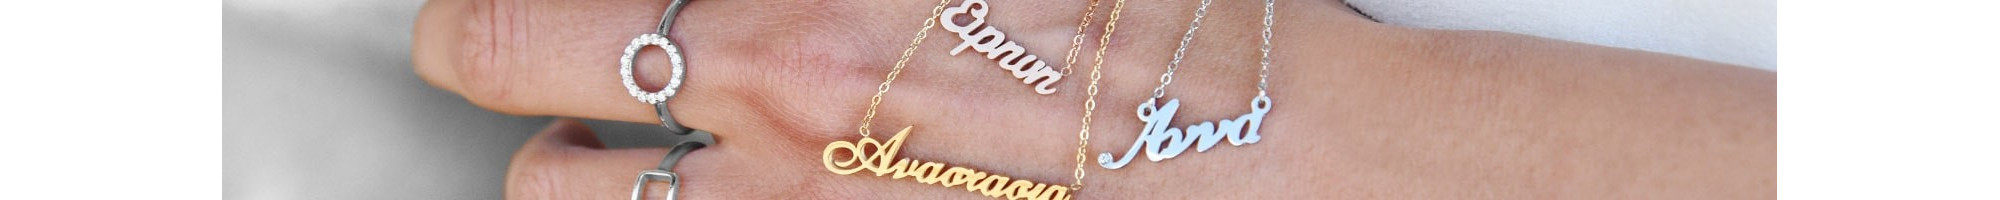 Greek Name Necklaces   Many designs online at BIJOU BOX